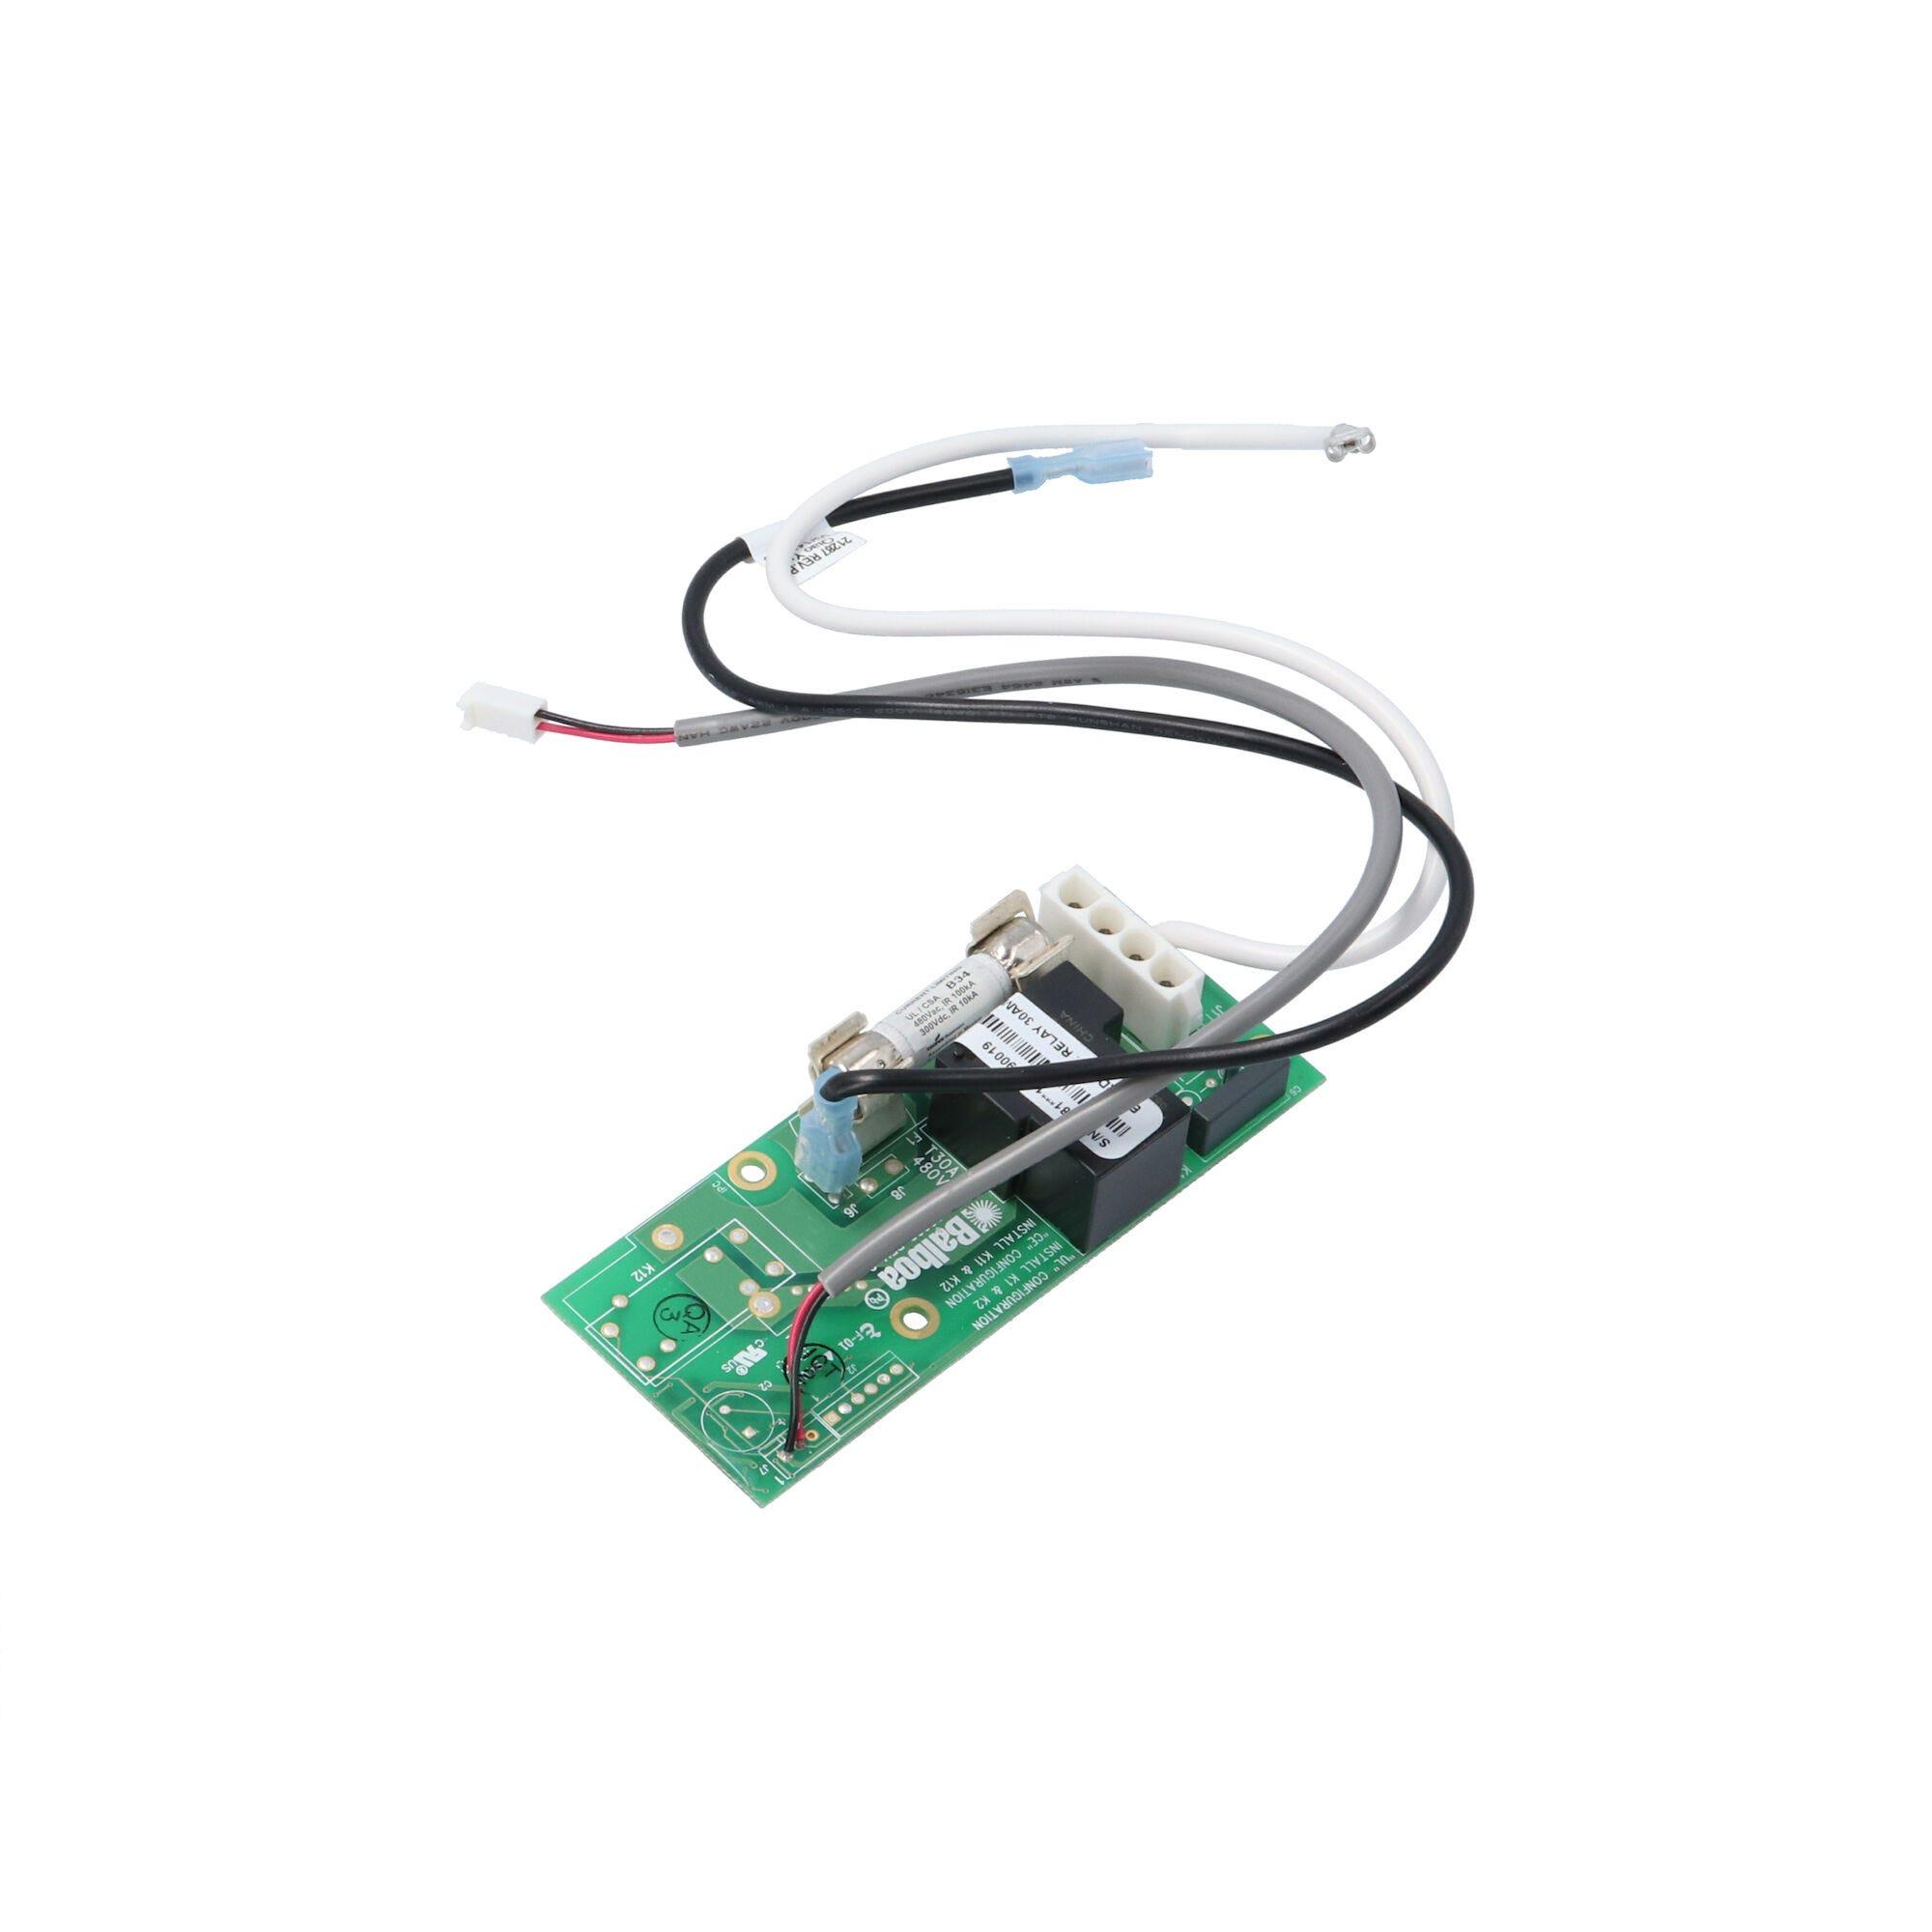 VS513 Series Circuit Board 1-Speed Pump w/30 Amp Fuse, w